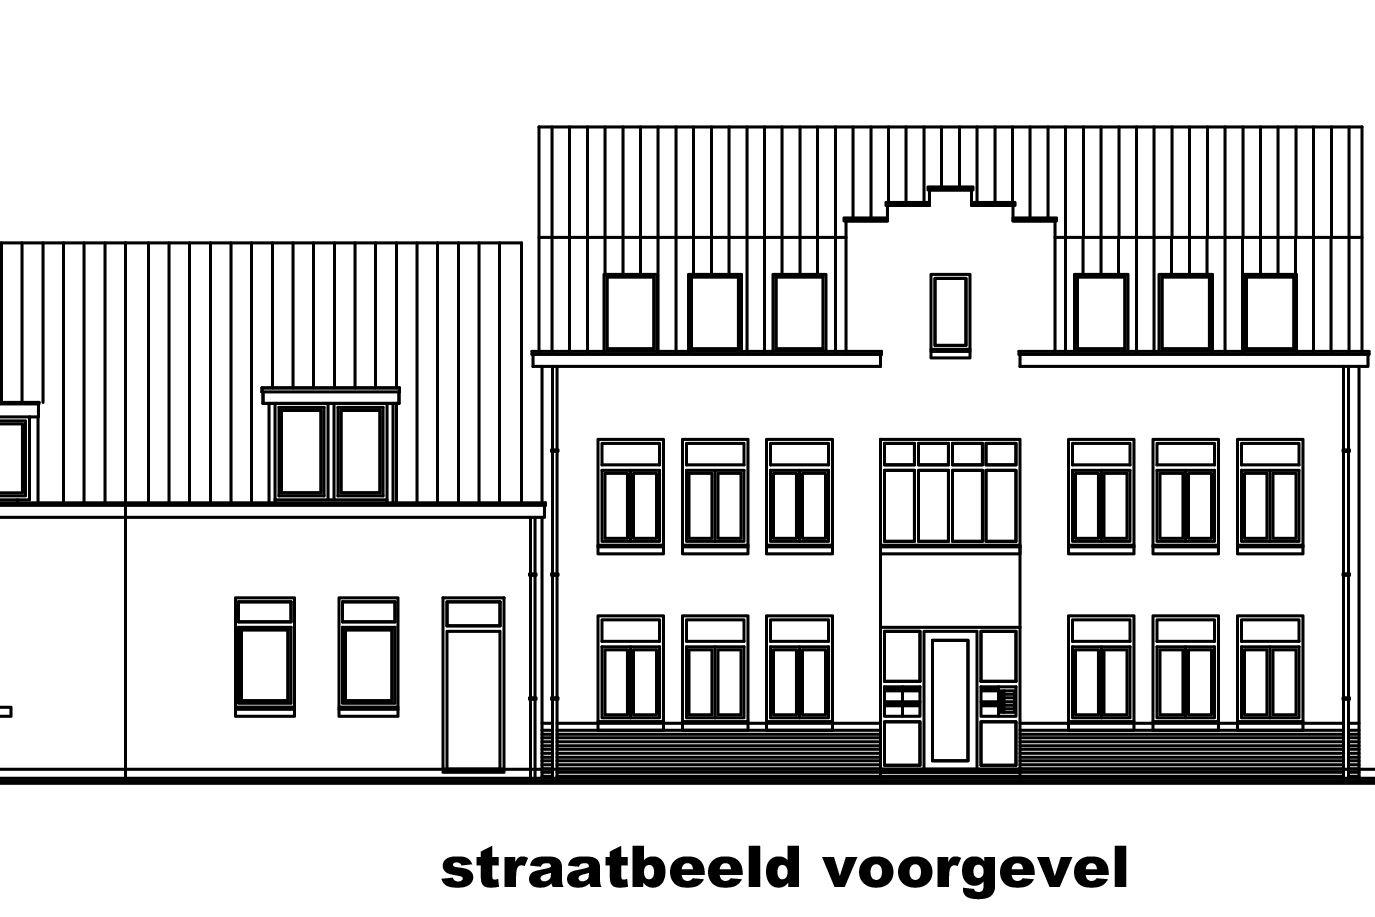 View photo 4 of Stationstraat type B 1e VERDIEPING